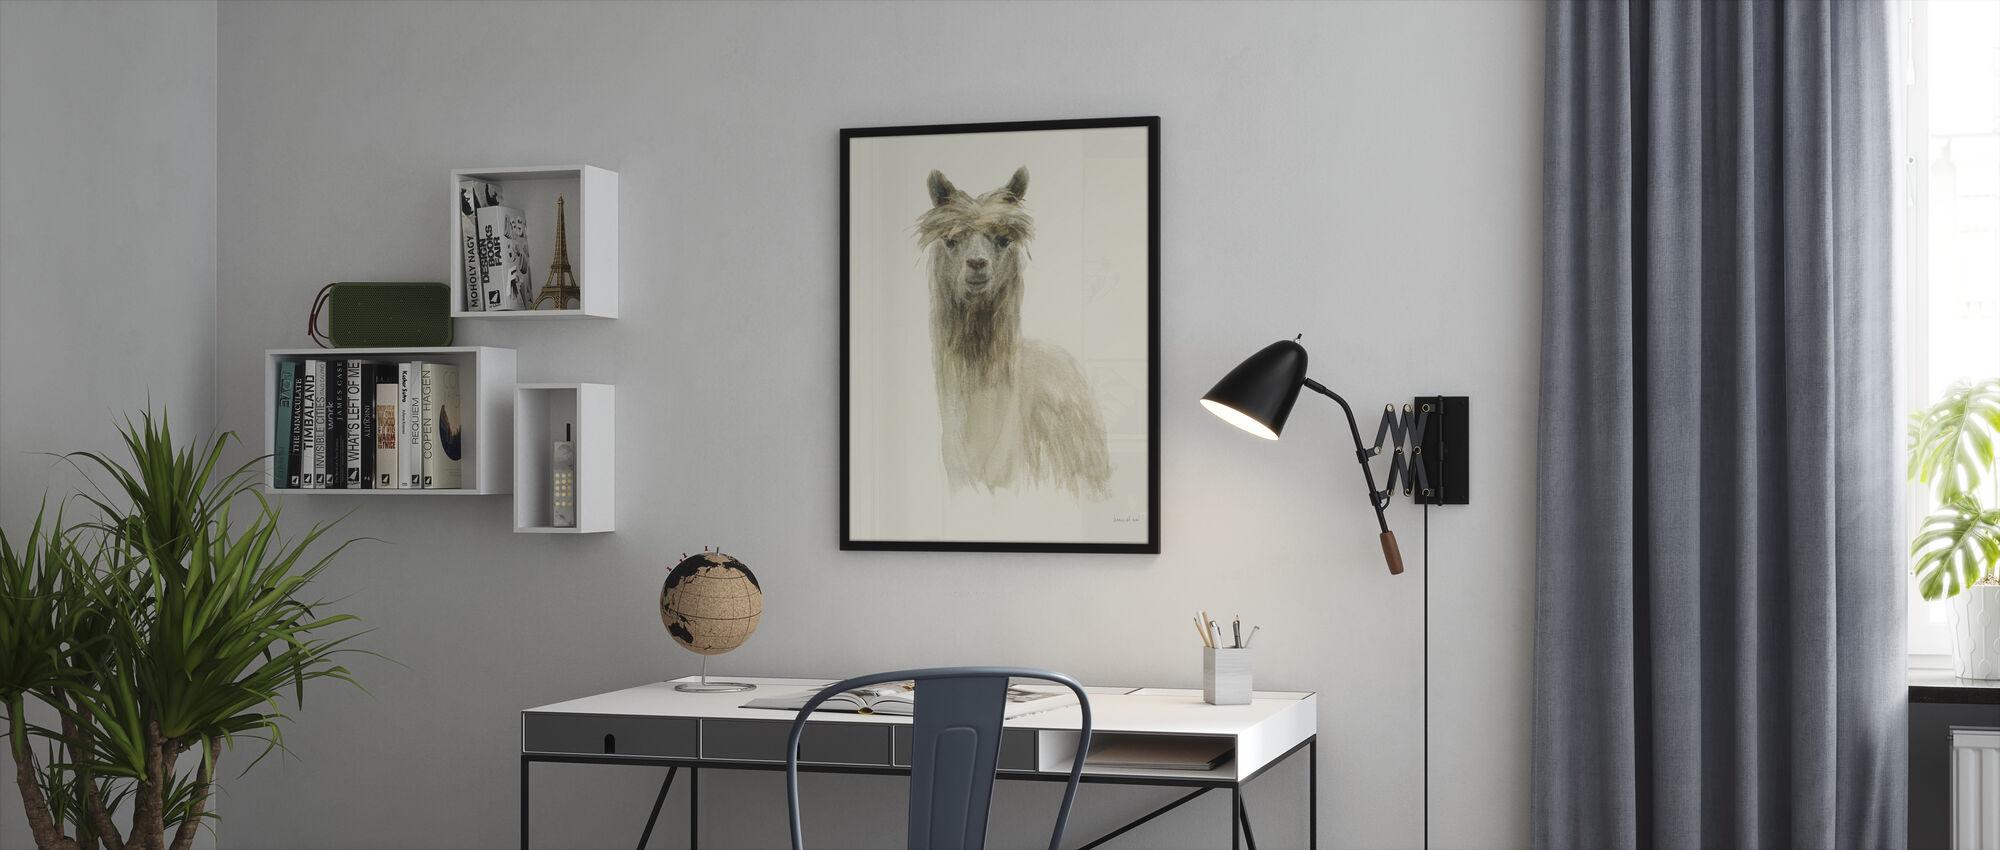 Classic Llamas I - Framed print - Office